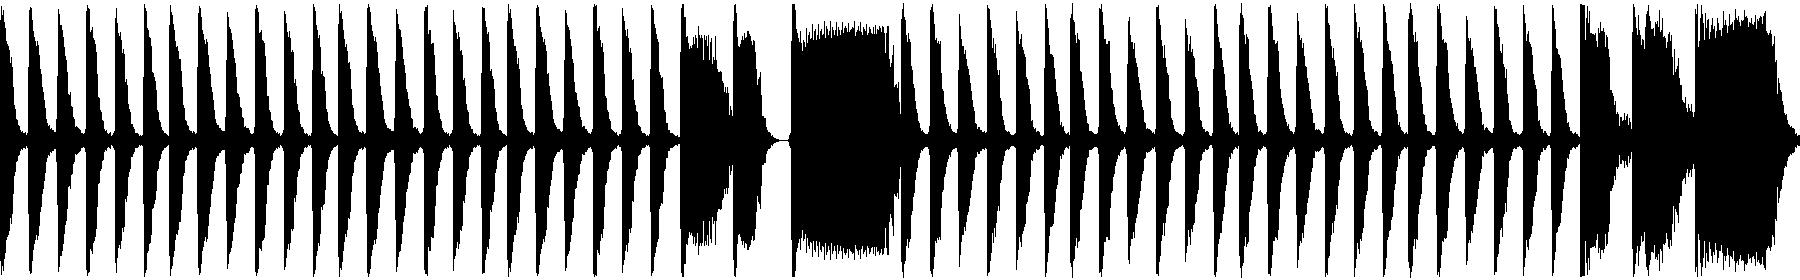 bass loop 140 bpm